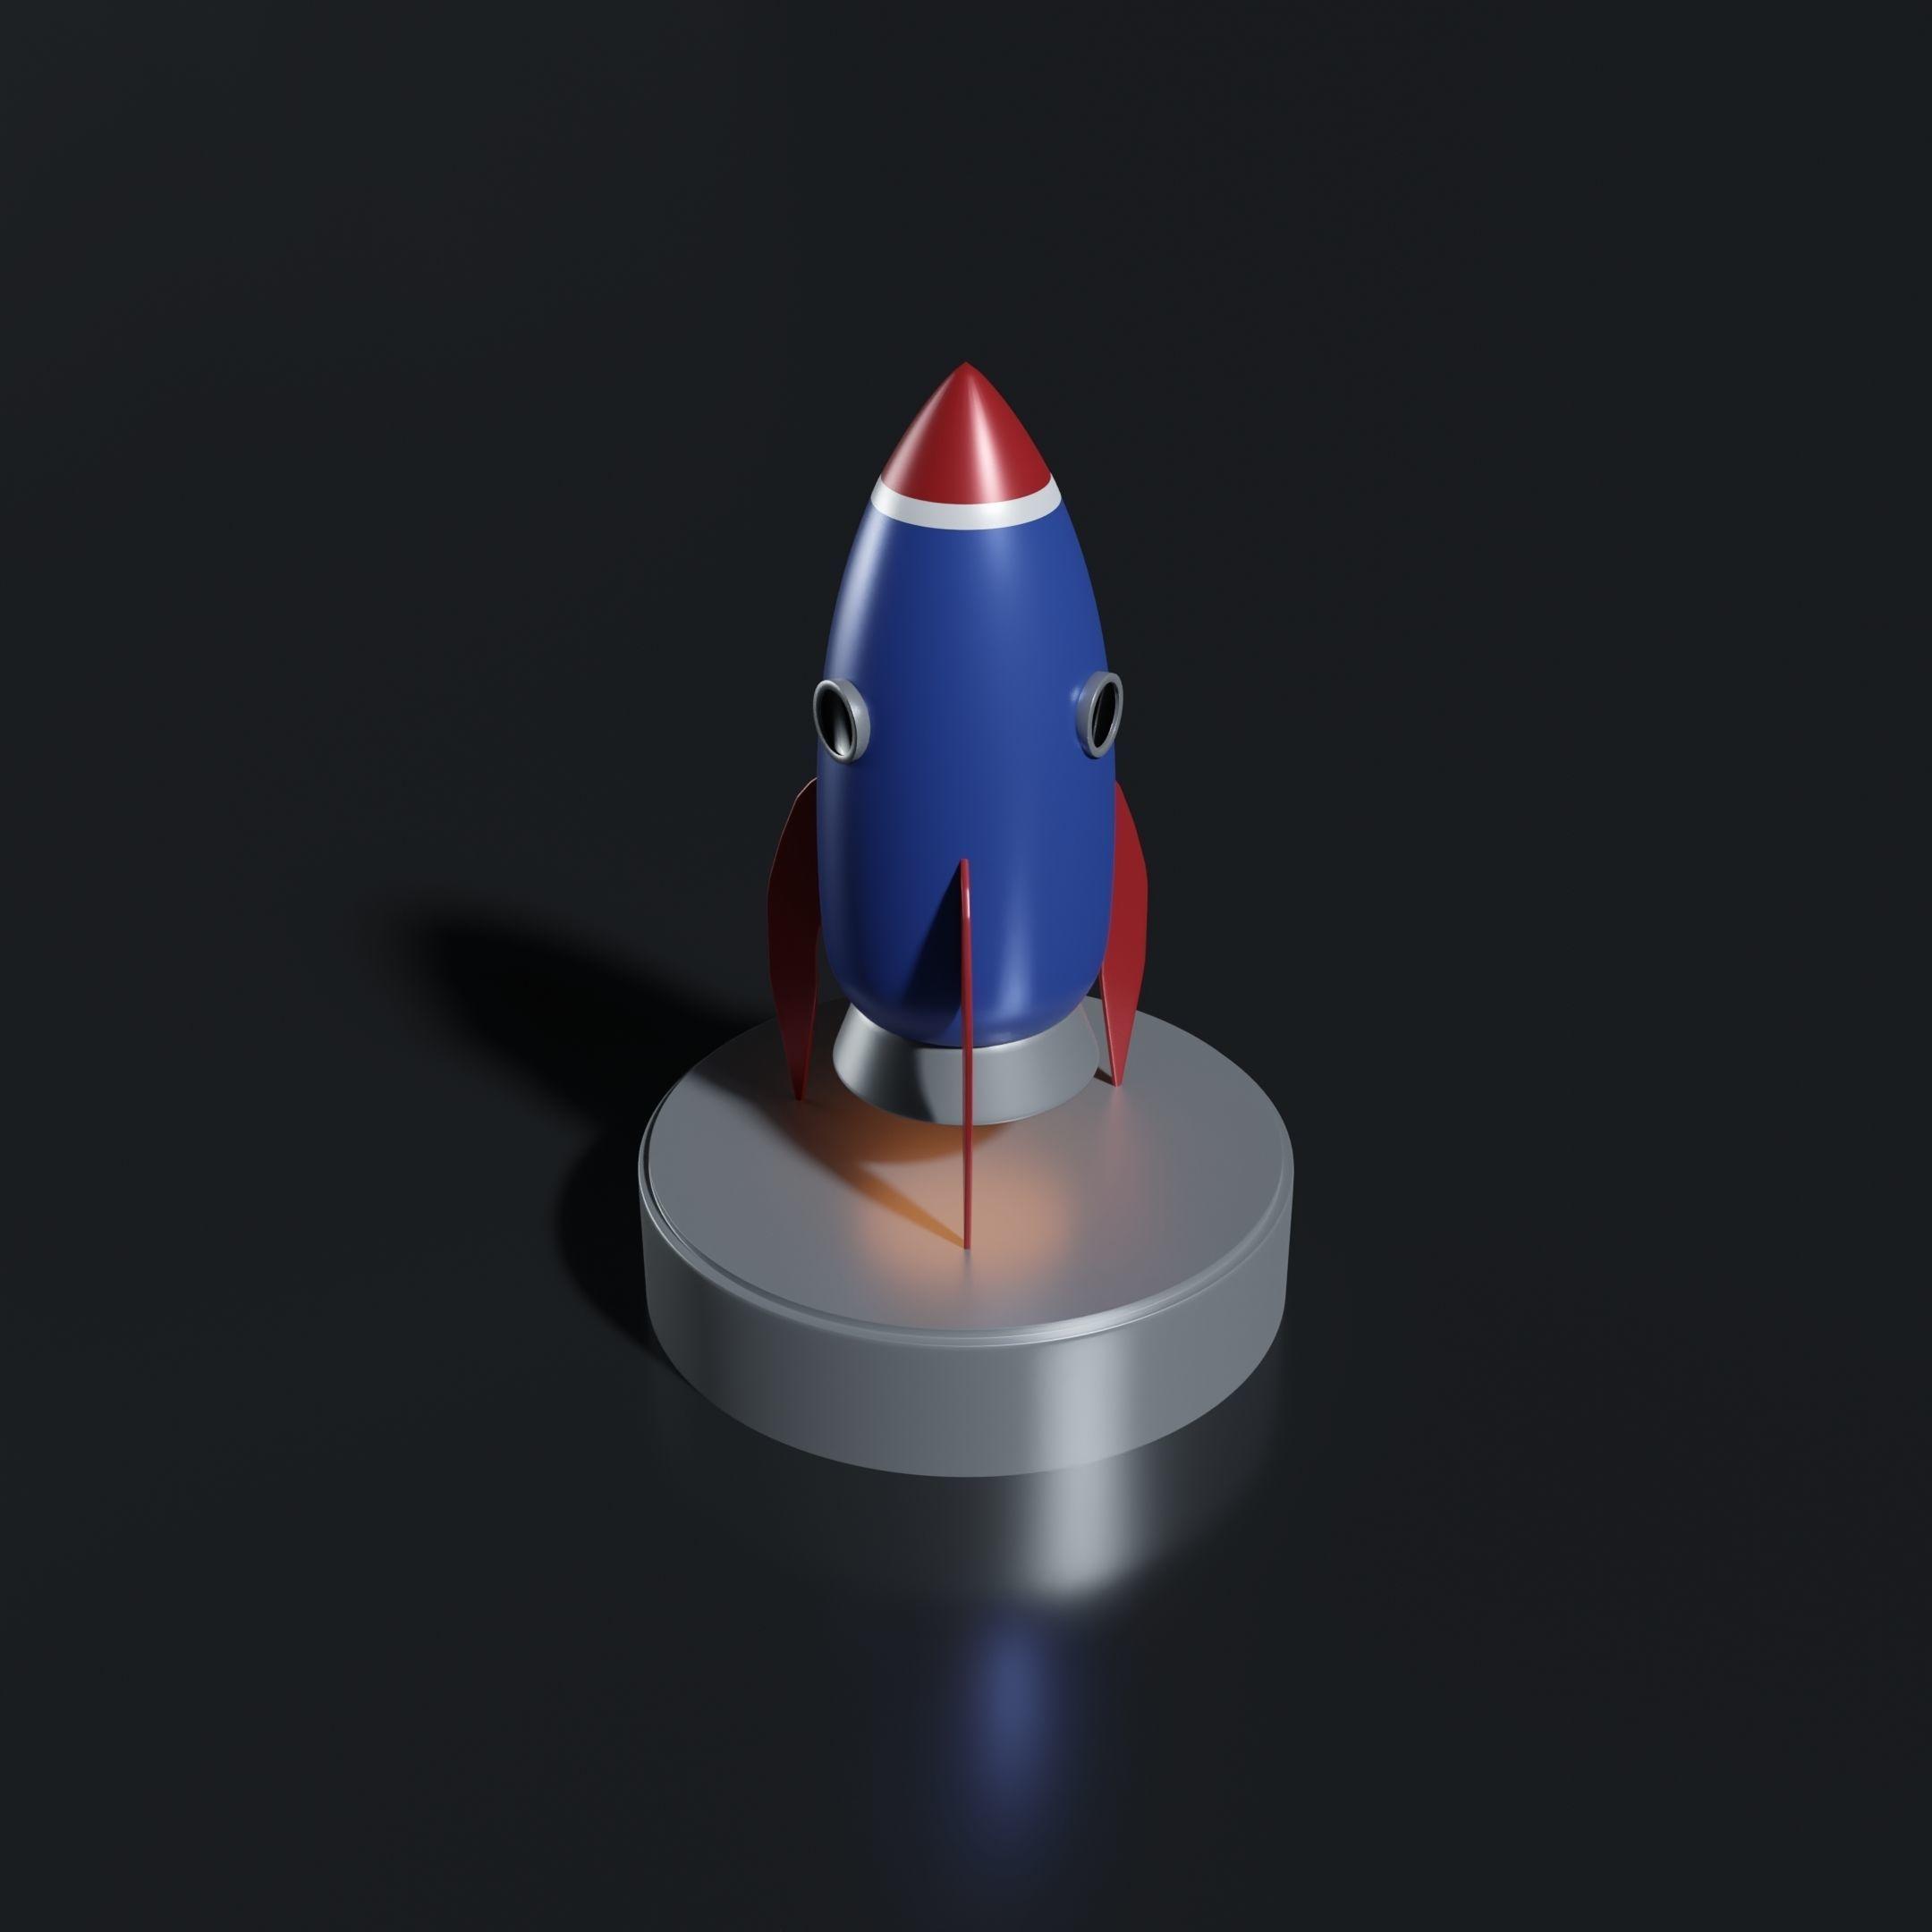 Cartoon Rocket Ship